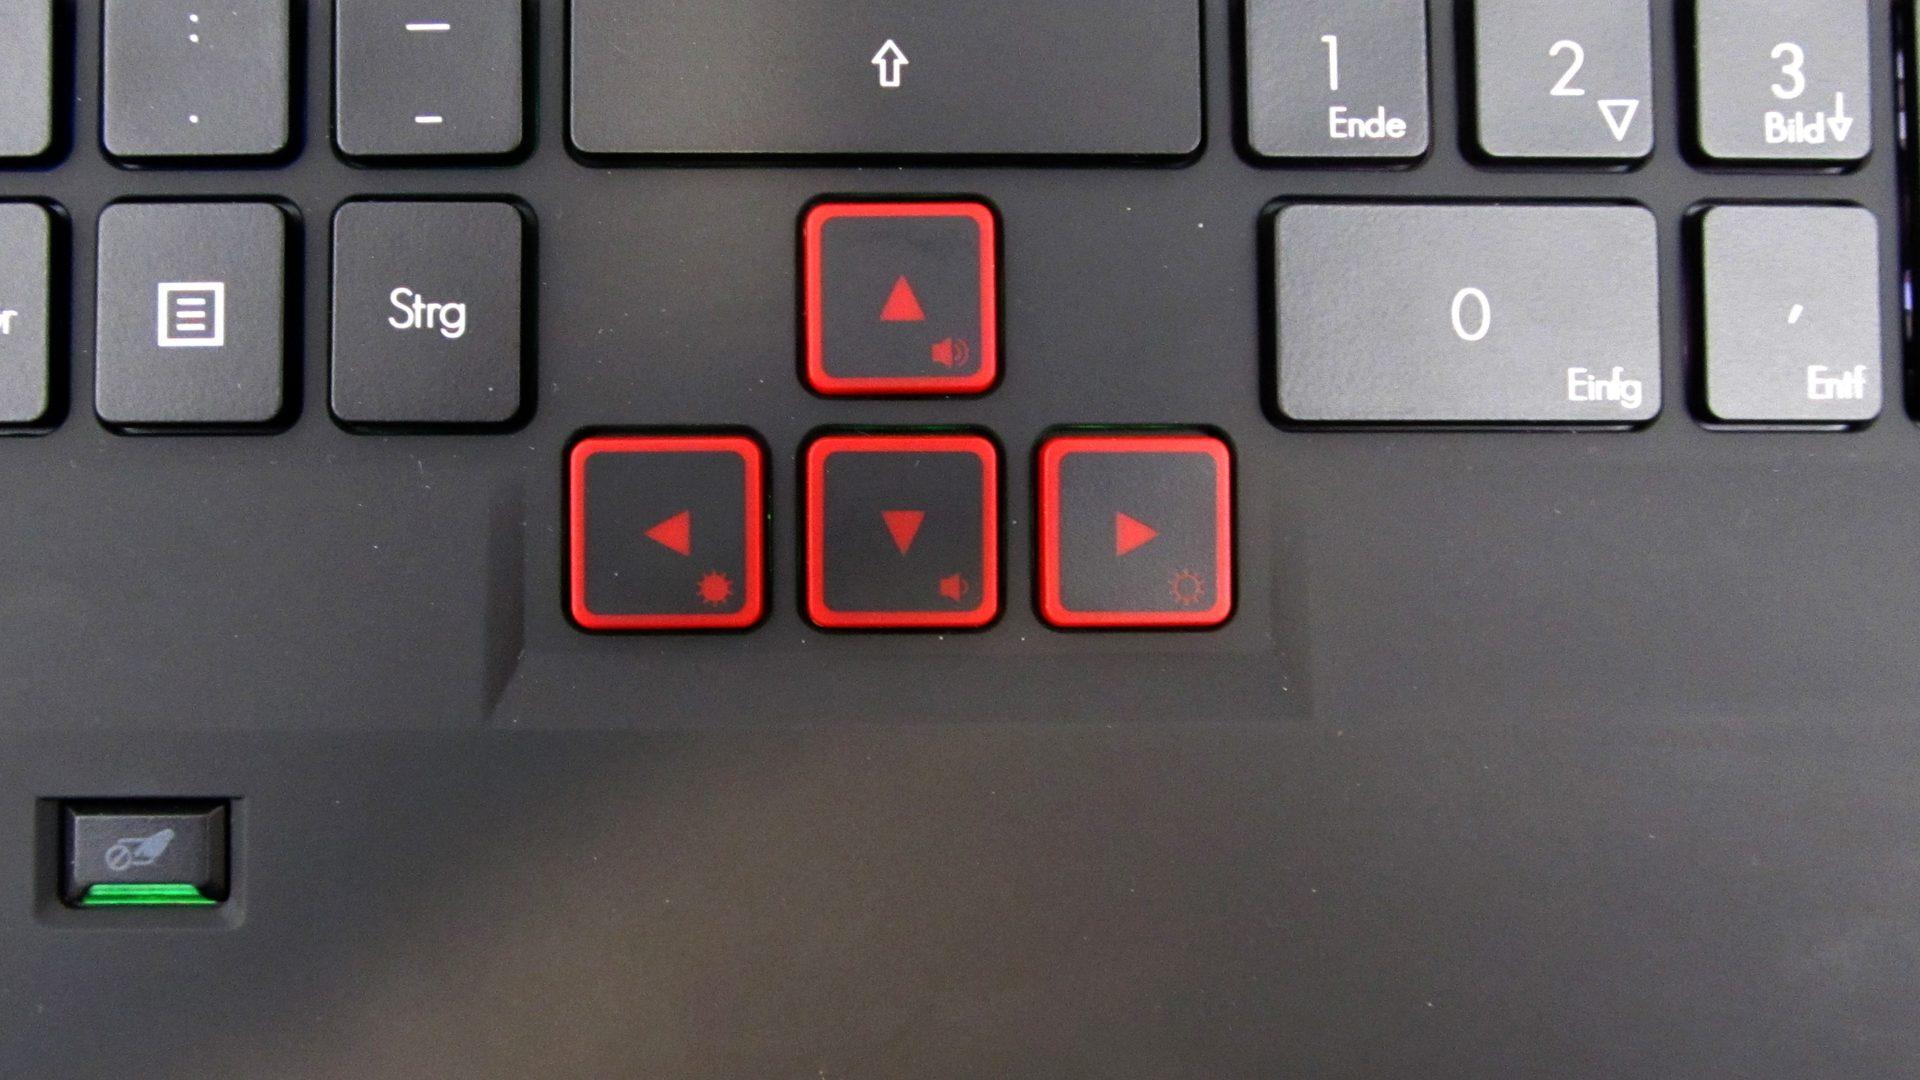 Acer-Predator-17-G9-793-718-Tastatur_5